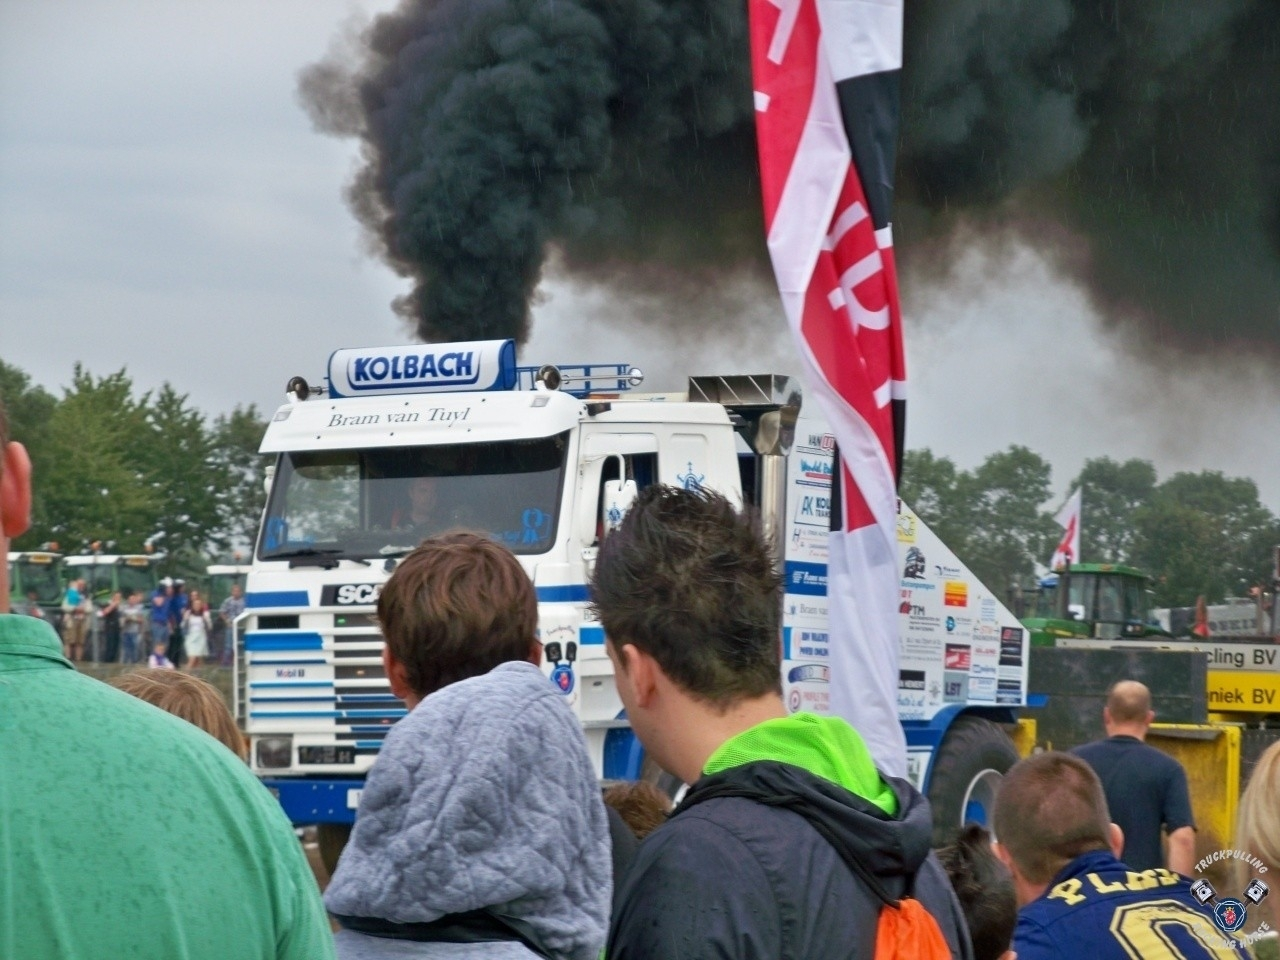 almkerk-2013-020